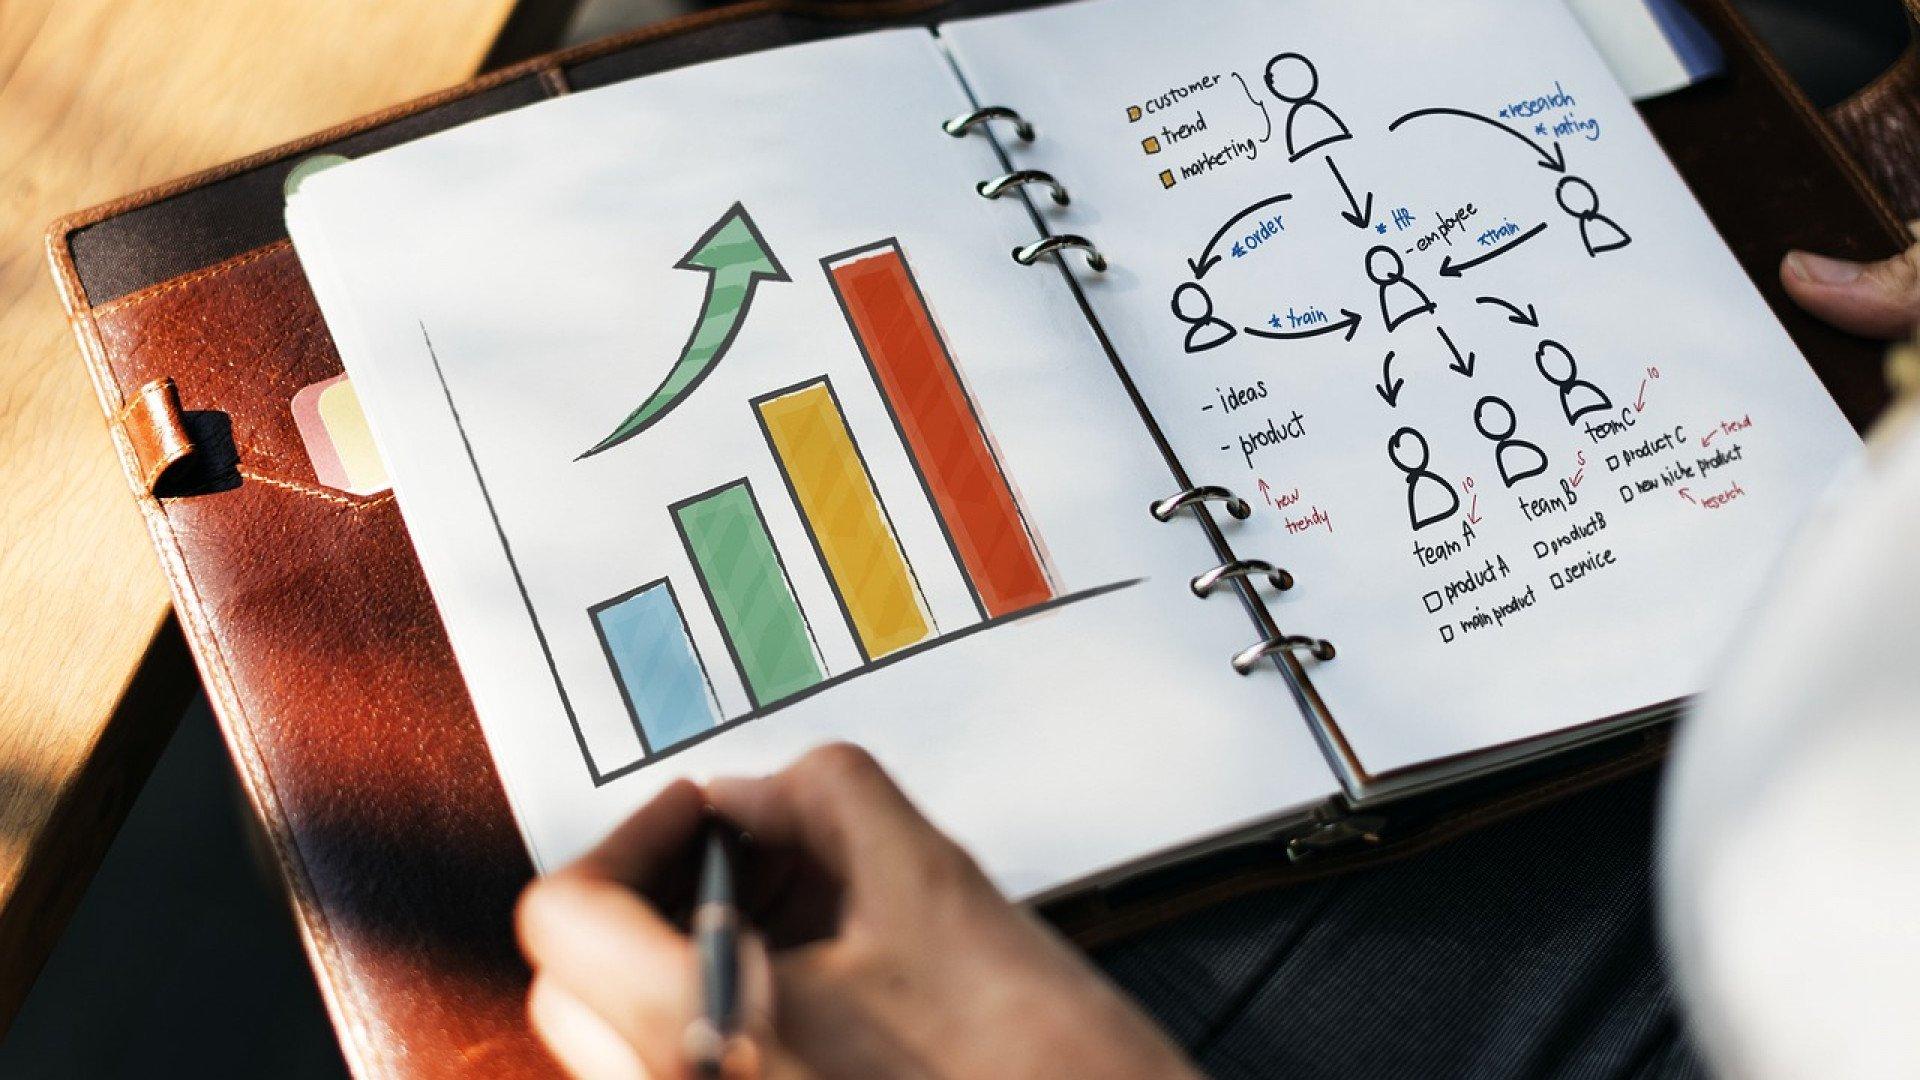 Passer d'autoentrepreneur à EURL ou SASU ? Comment choisir ?